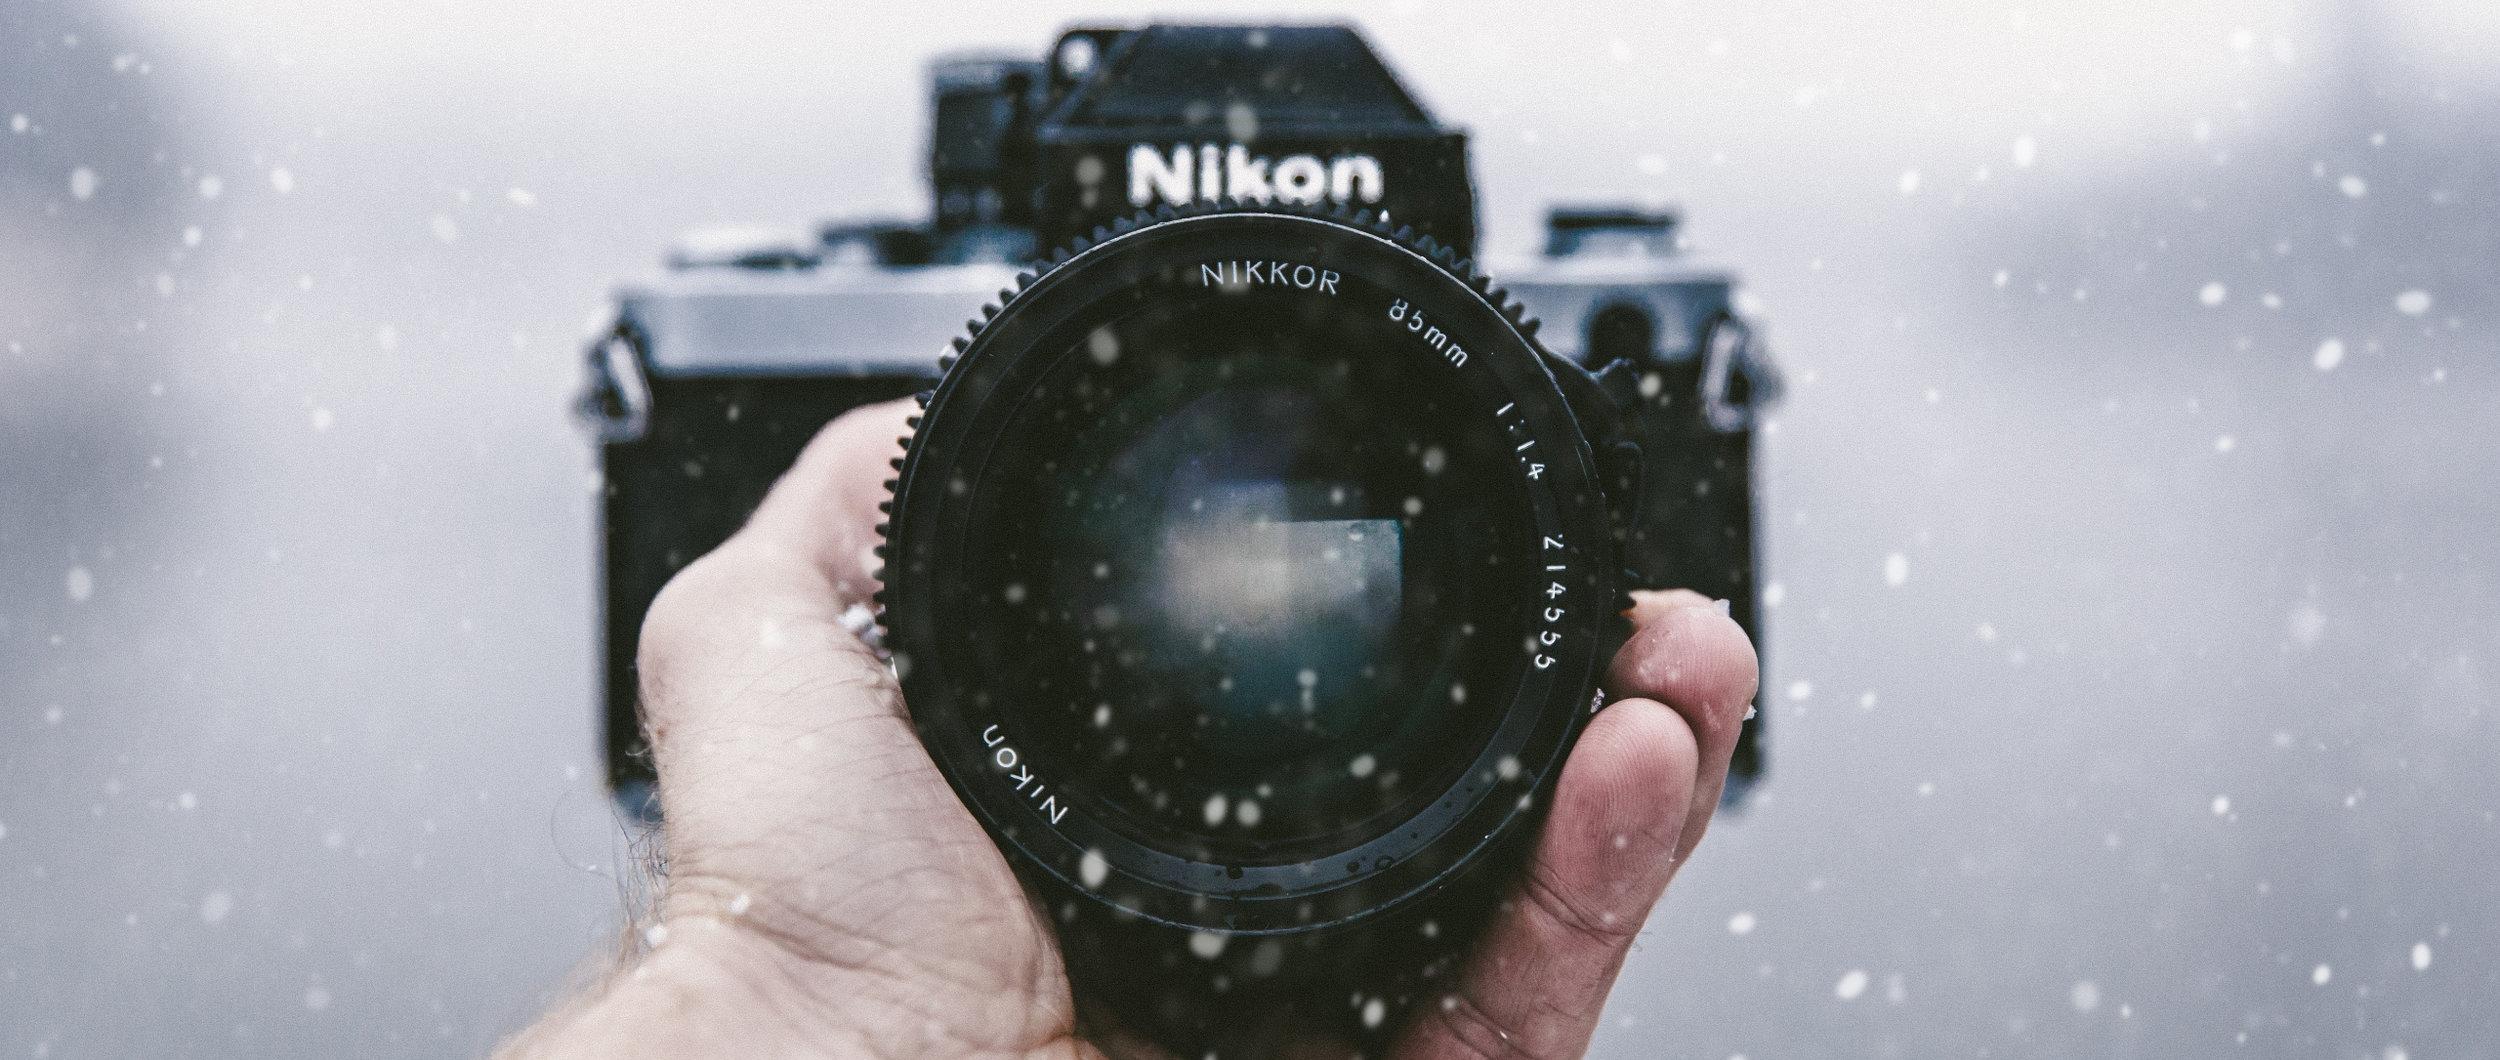 Camera in snow.jpeg